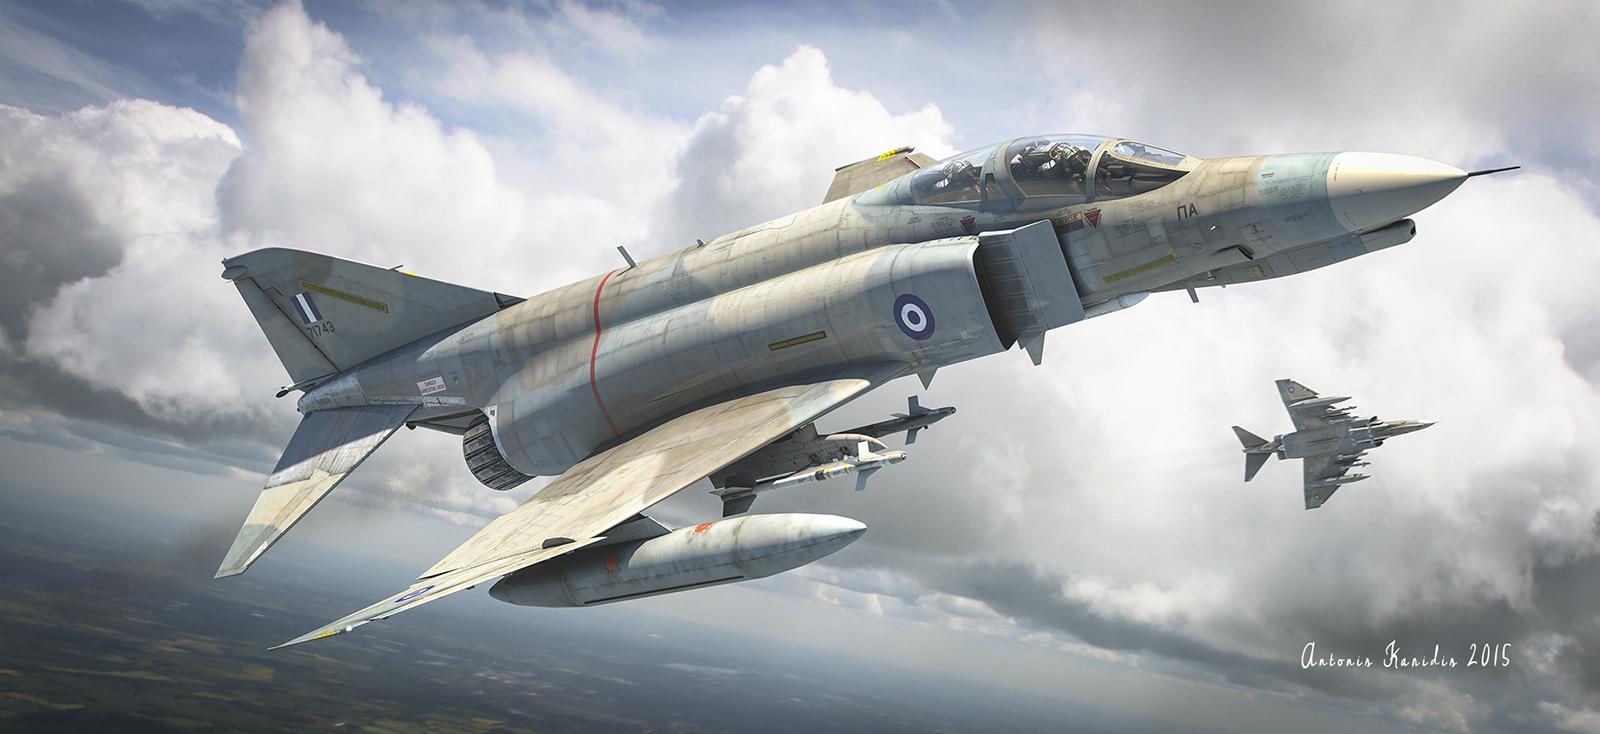 Hellenic Air Force F 4 Phantom By Roen911 On Deviantart